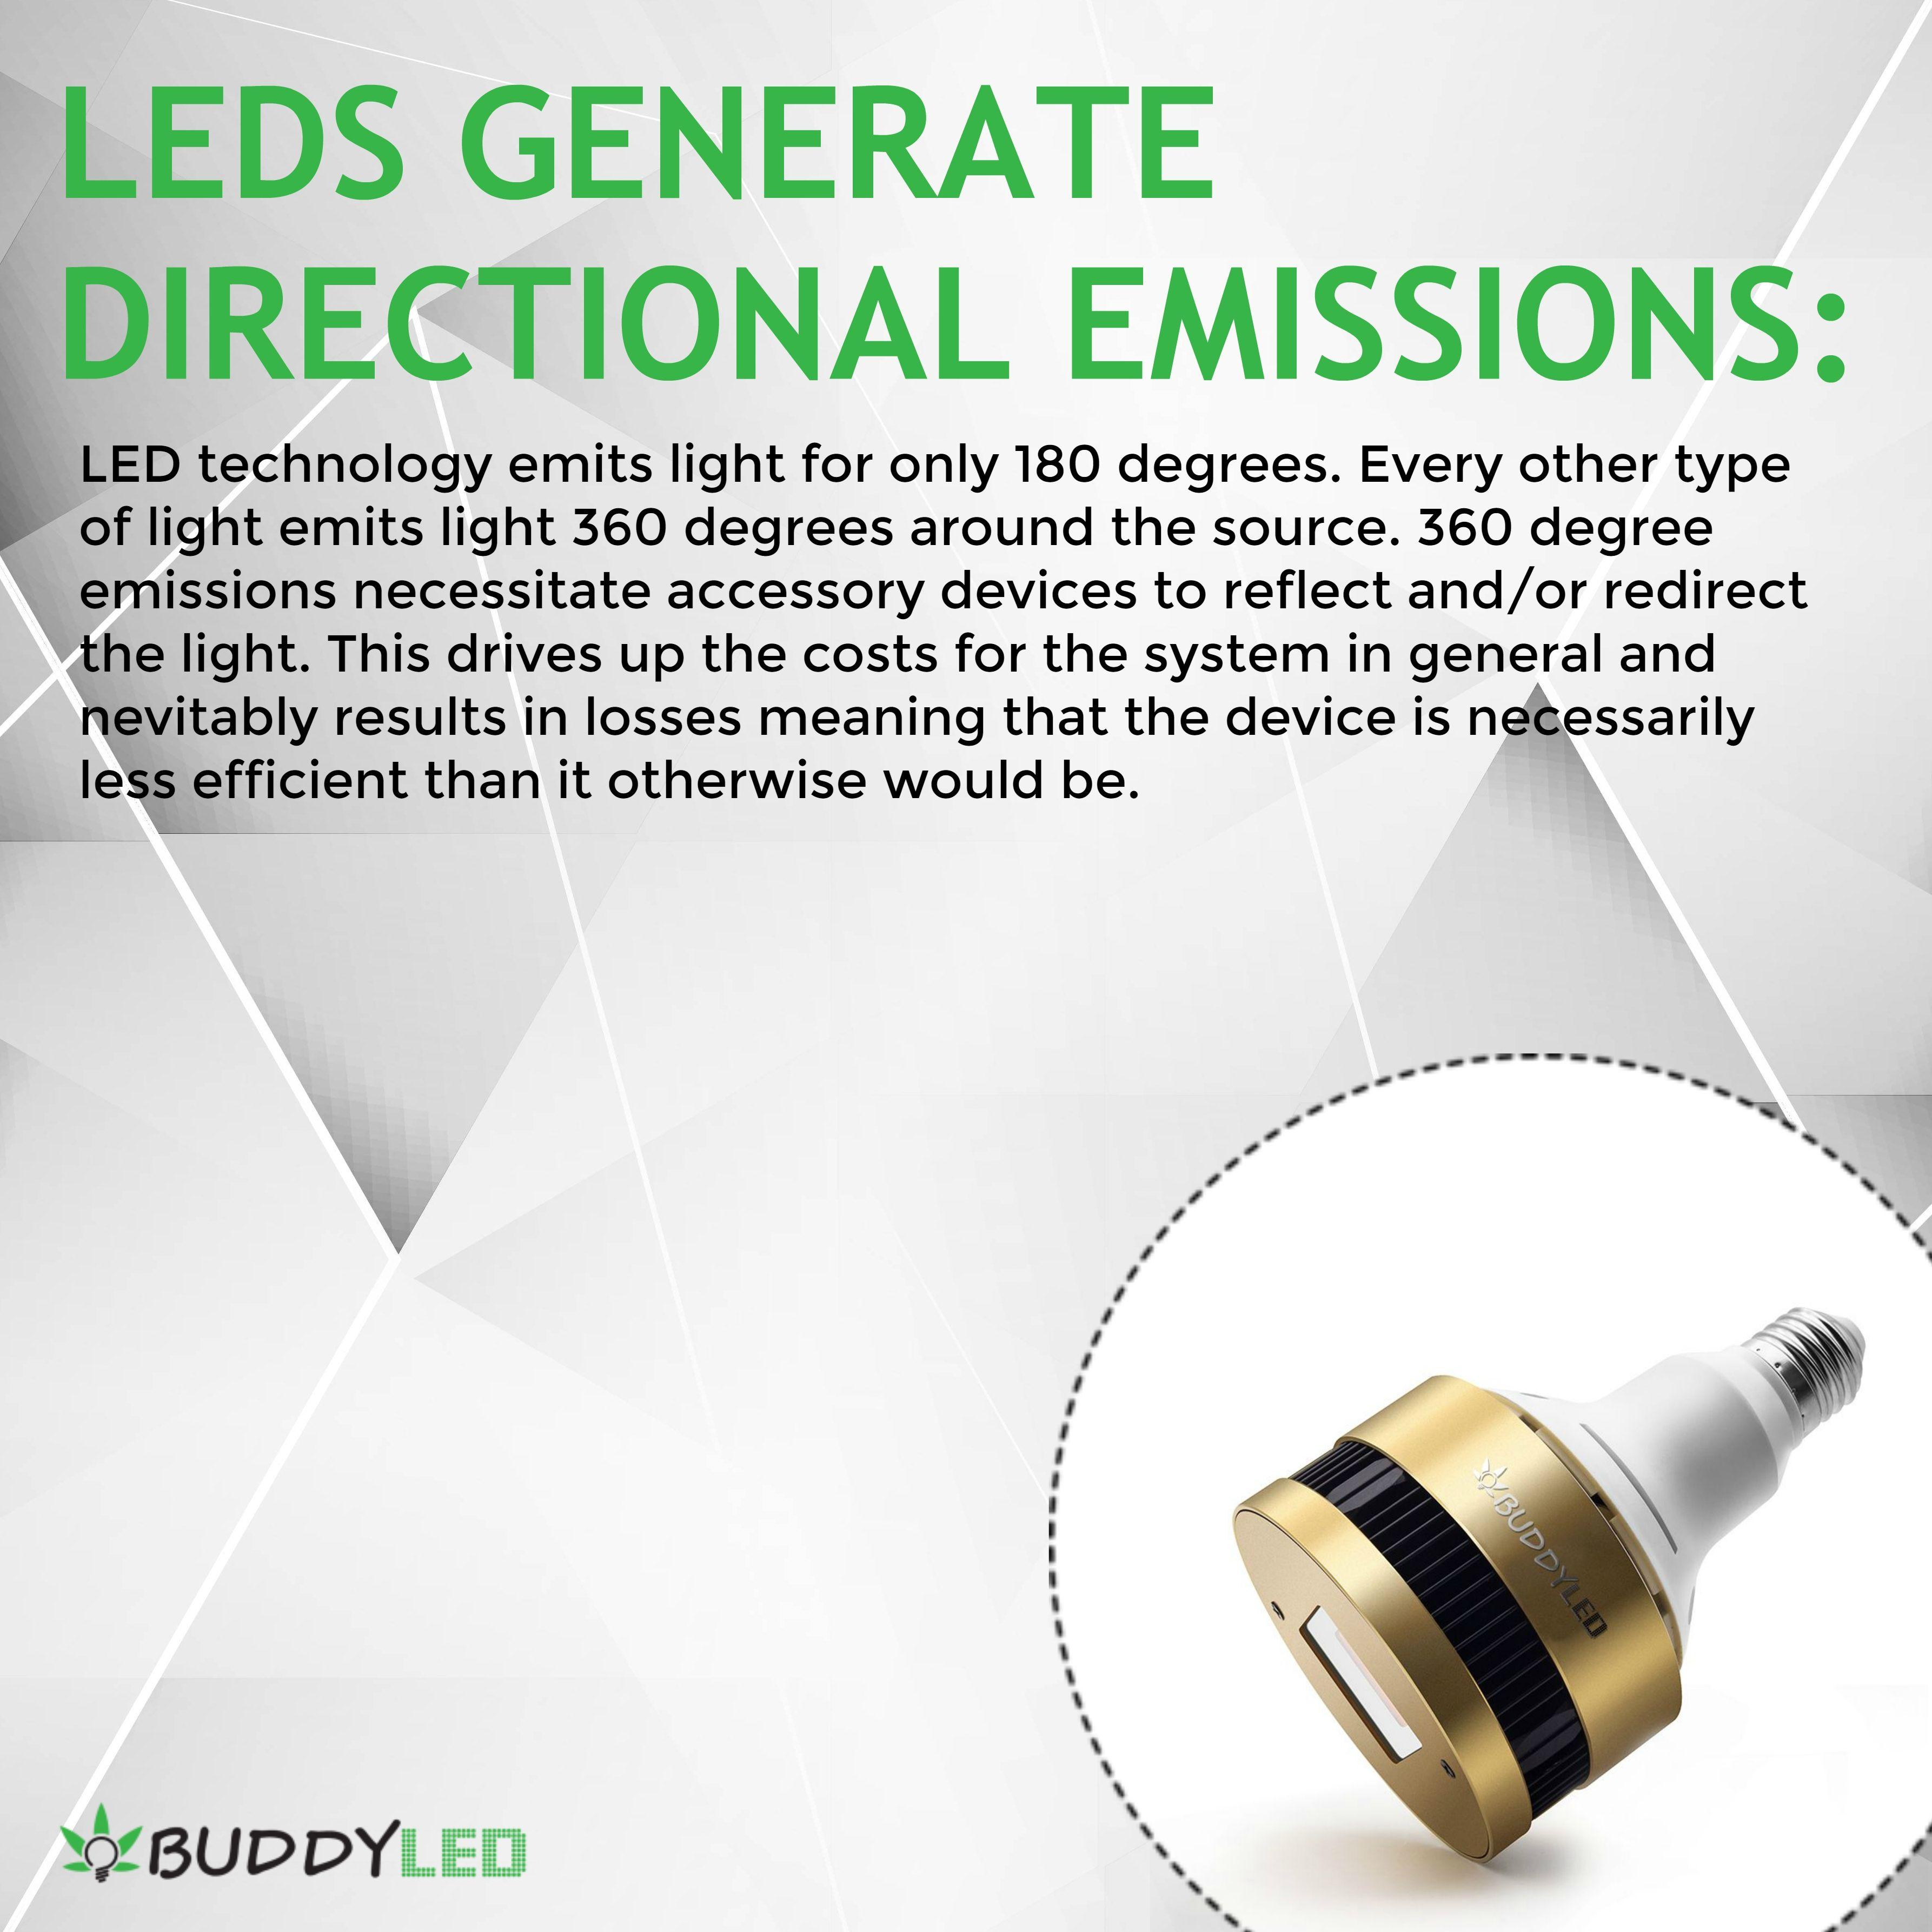 Led Technology Emits Light For Only 180 Degrees Every Other Type Of Light Emits Light 30 Degrees Around The Source Led Technology Types Of Lighting Led Lights